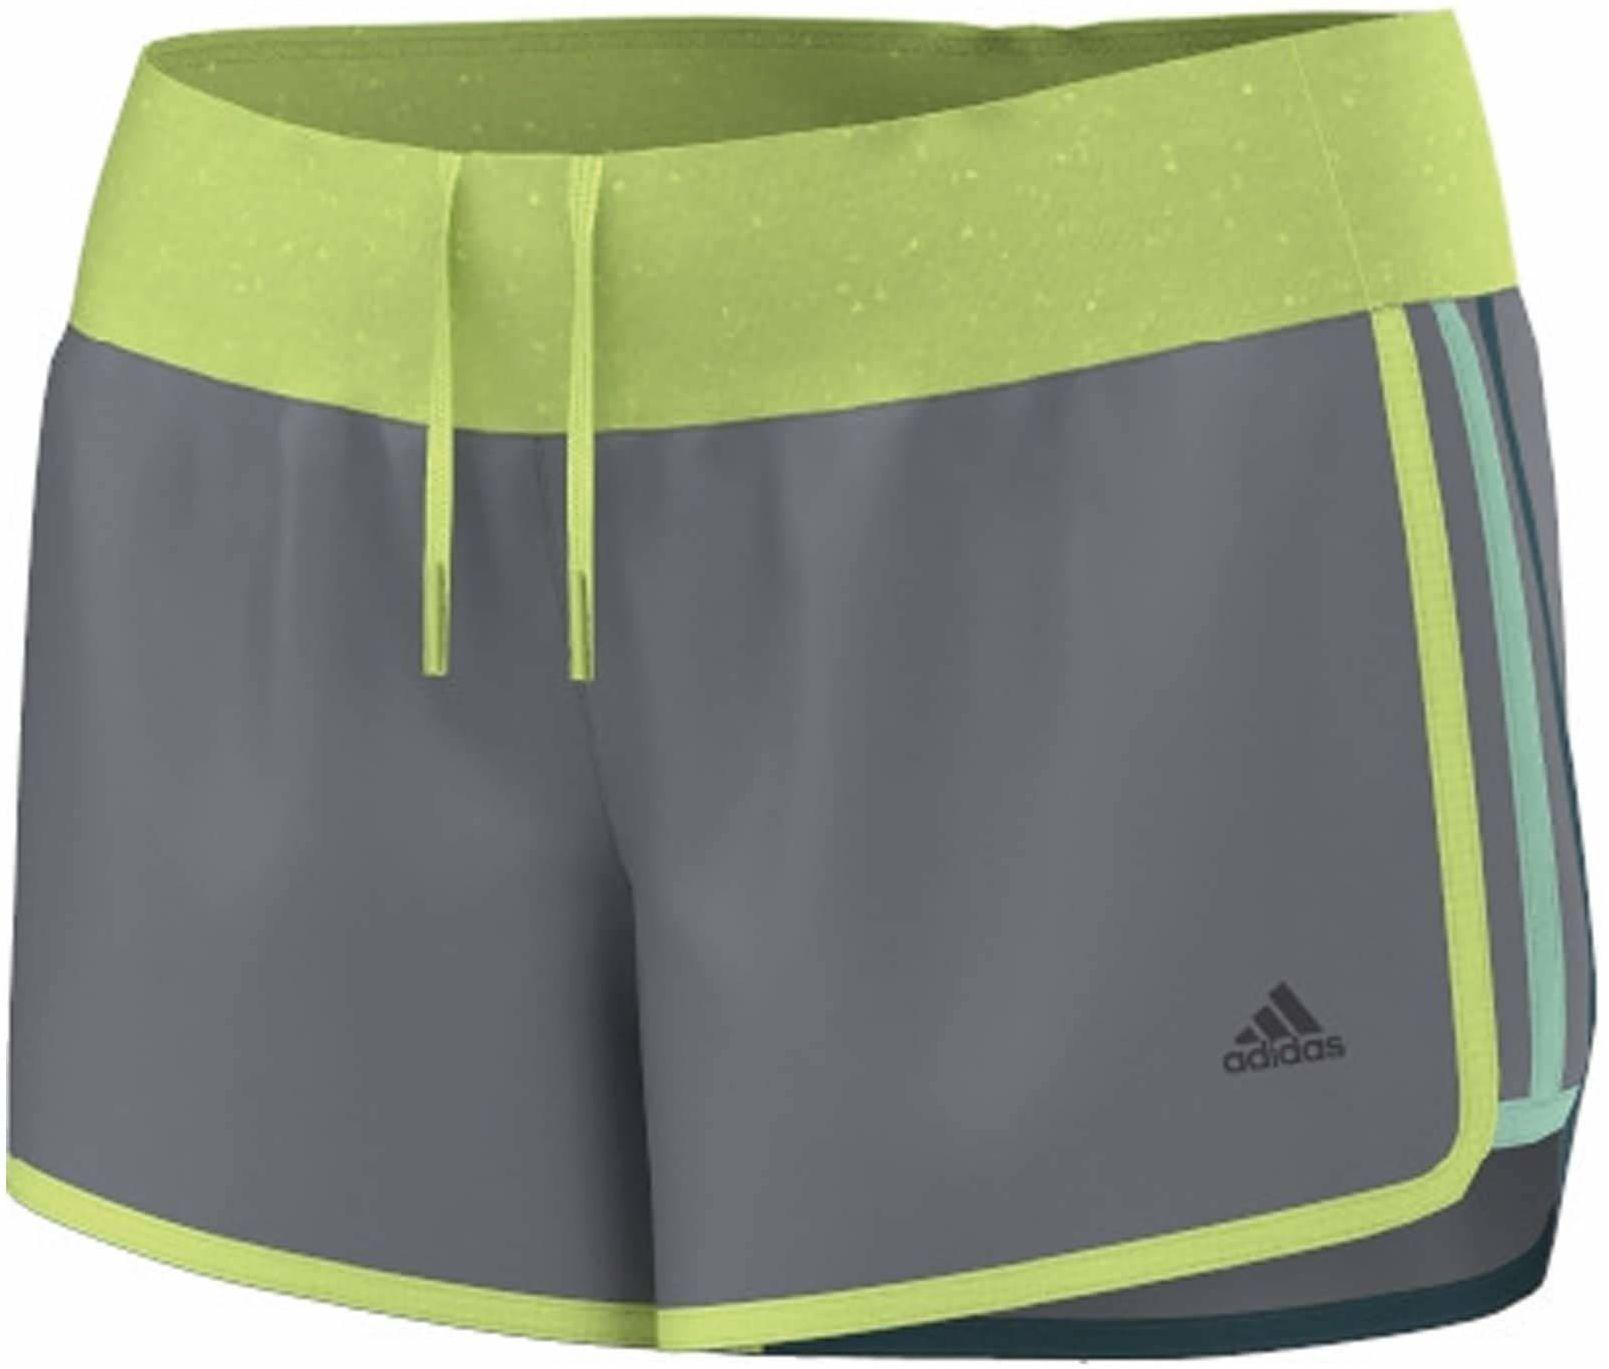 adidas damska sukienka na nogę Aktiv Marathon 10 szorty damskie, szara, XL